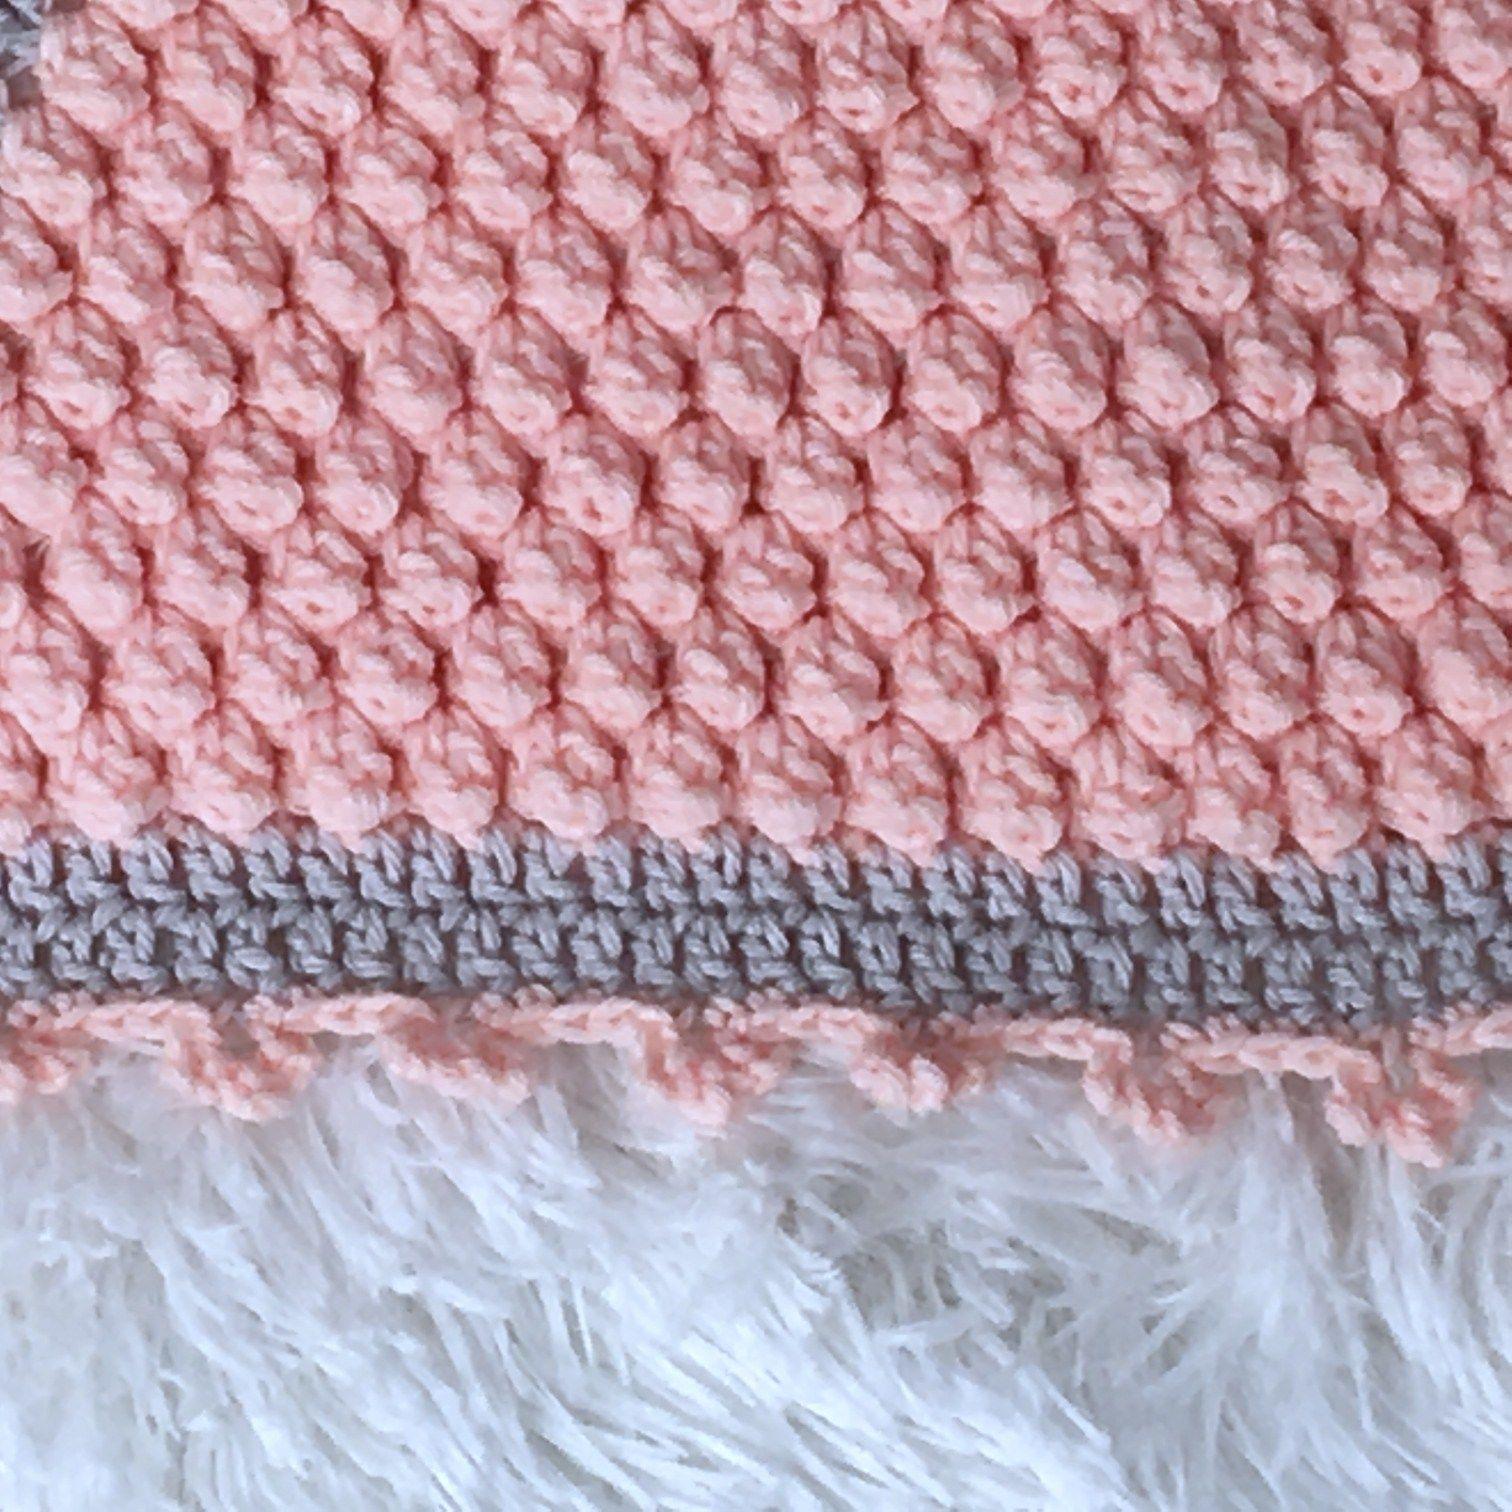 b2677fb70cfe8 Cross My Heart Baby Blanket Free Crochet Pattern | Crochet and ...